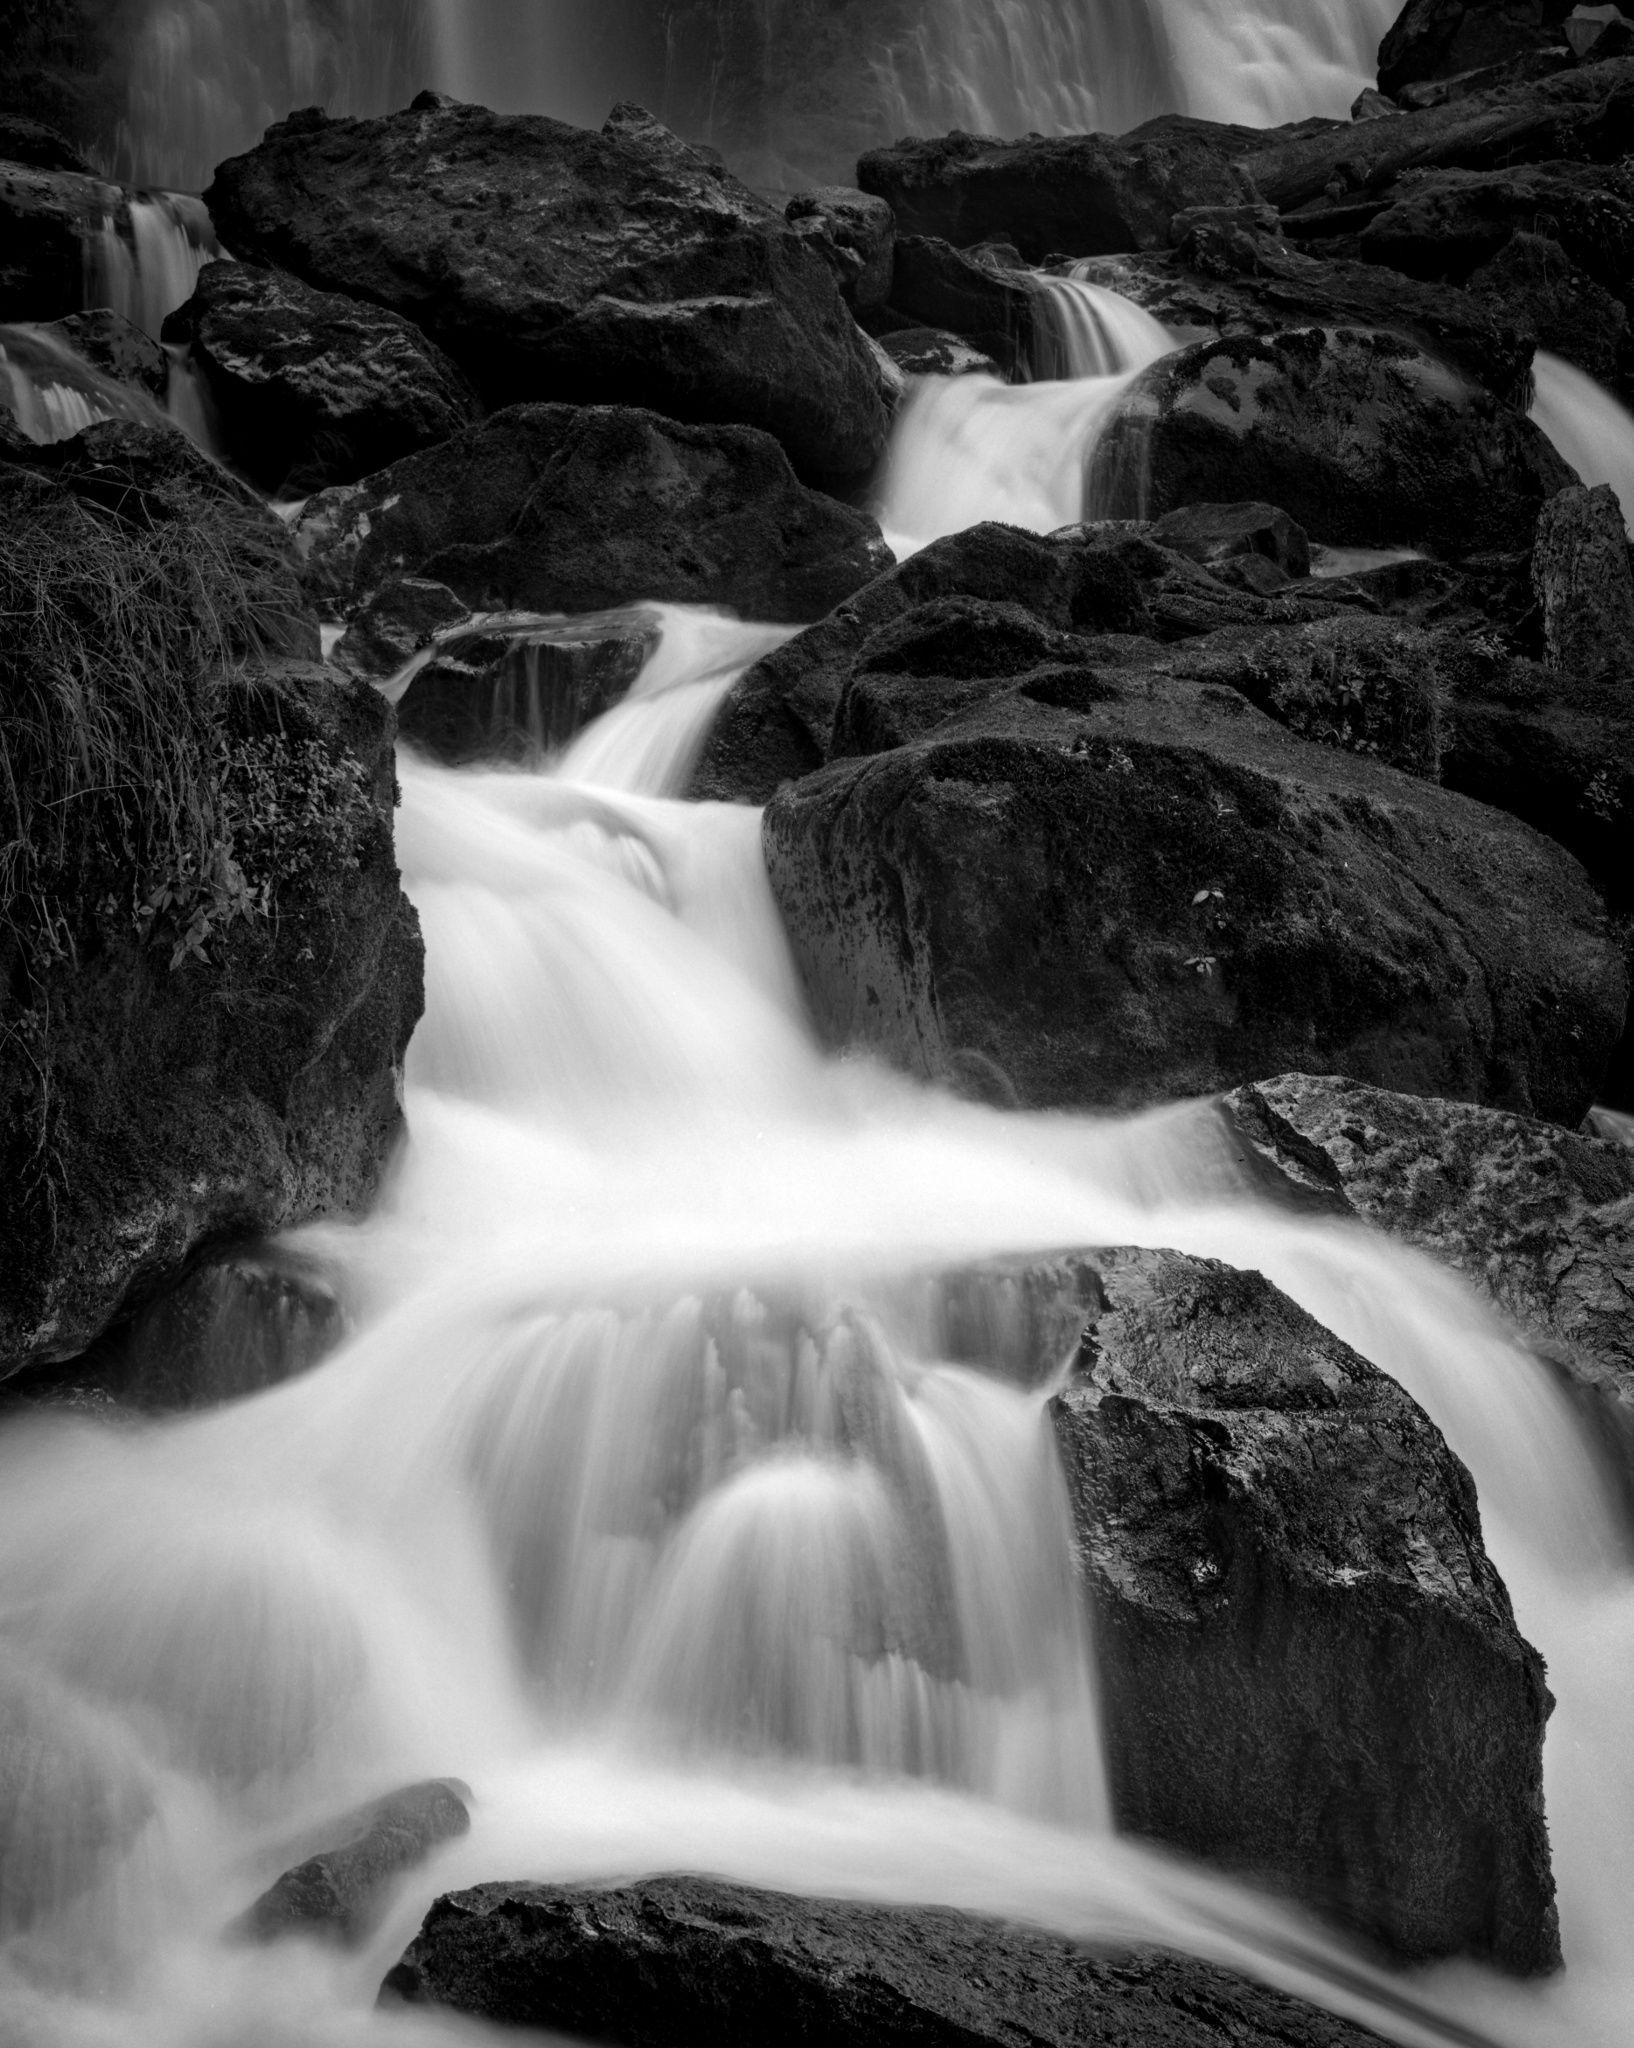 Upper Falls Creek Falls 2 by Jason Lucey on 500px